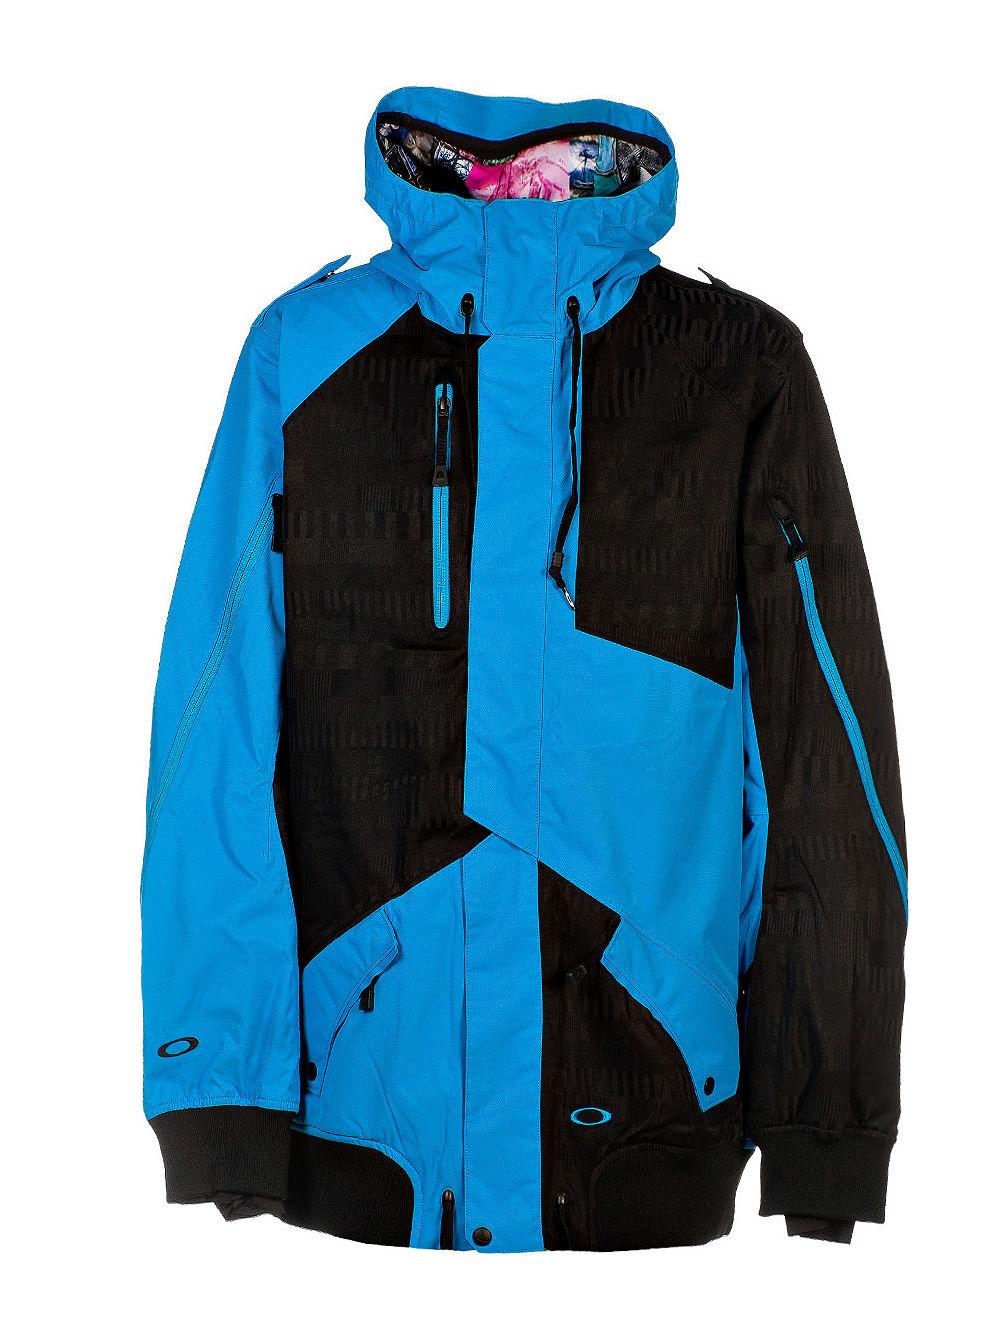 Buy Oakley Preferred Jacket online at blue-tomato.com